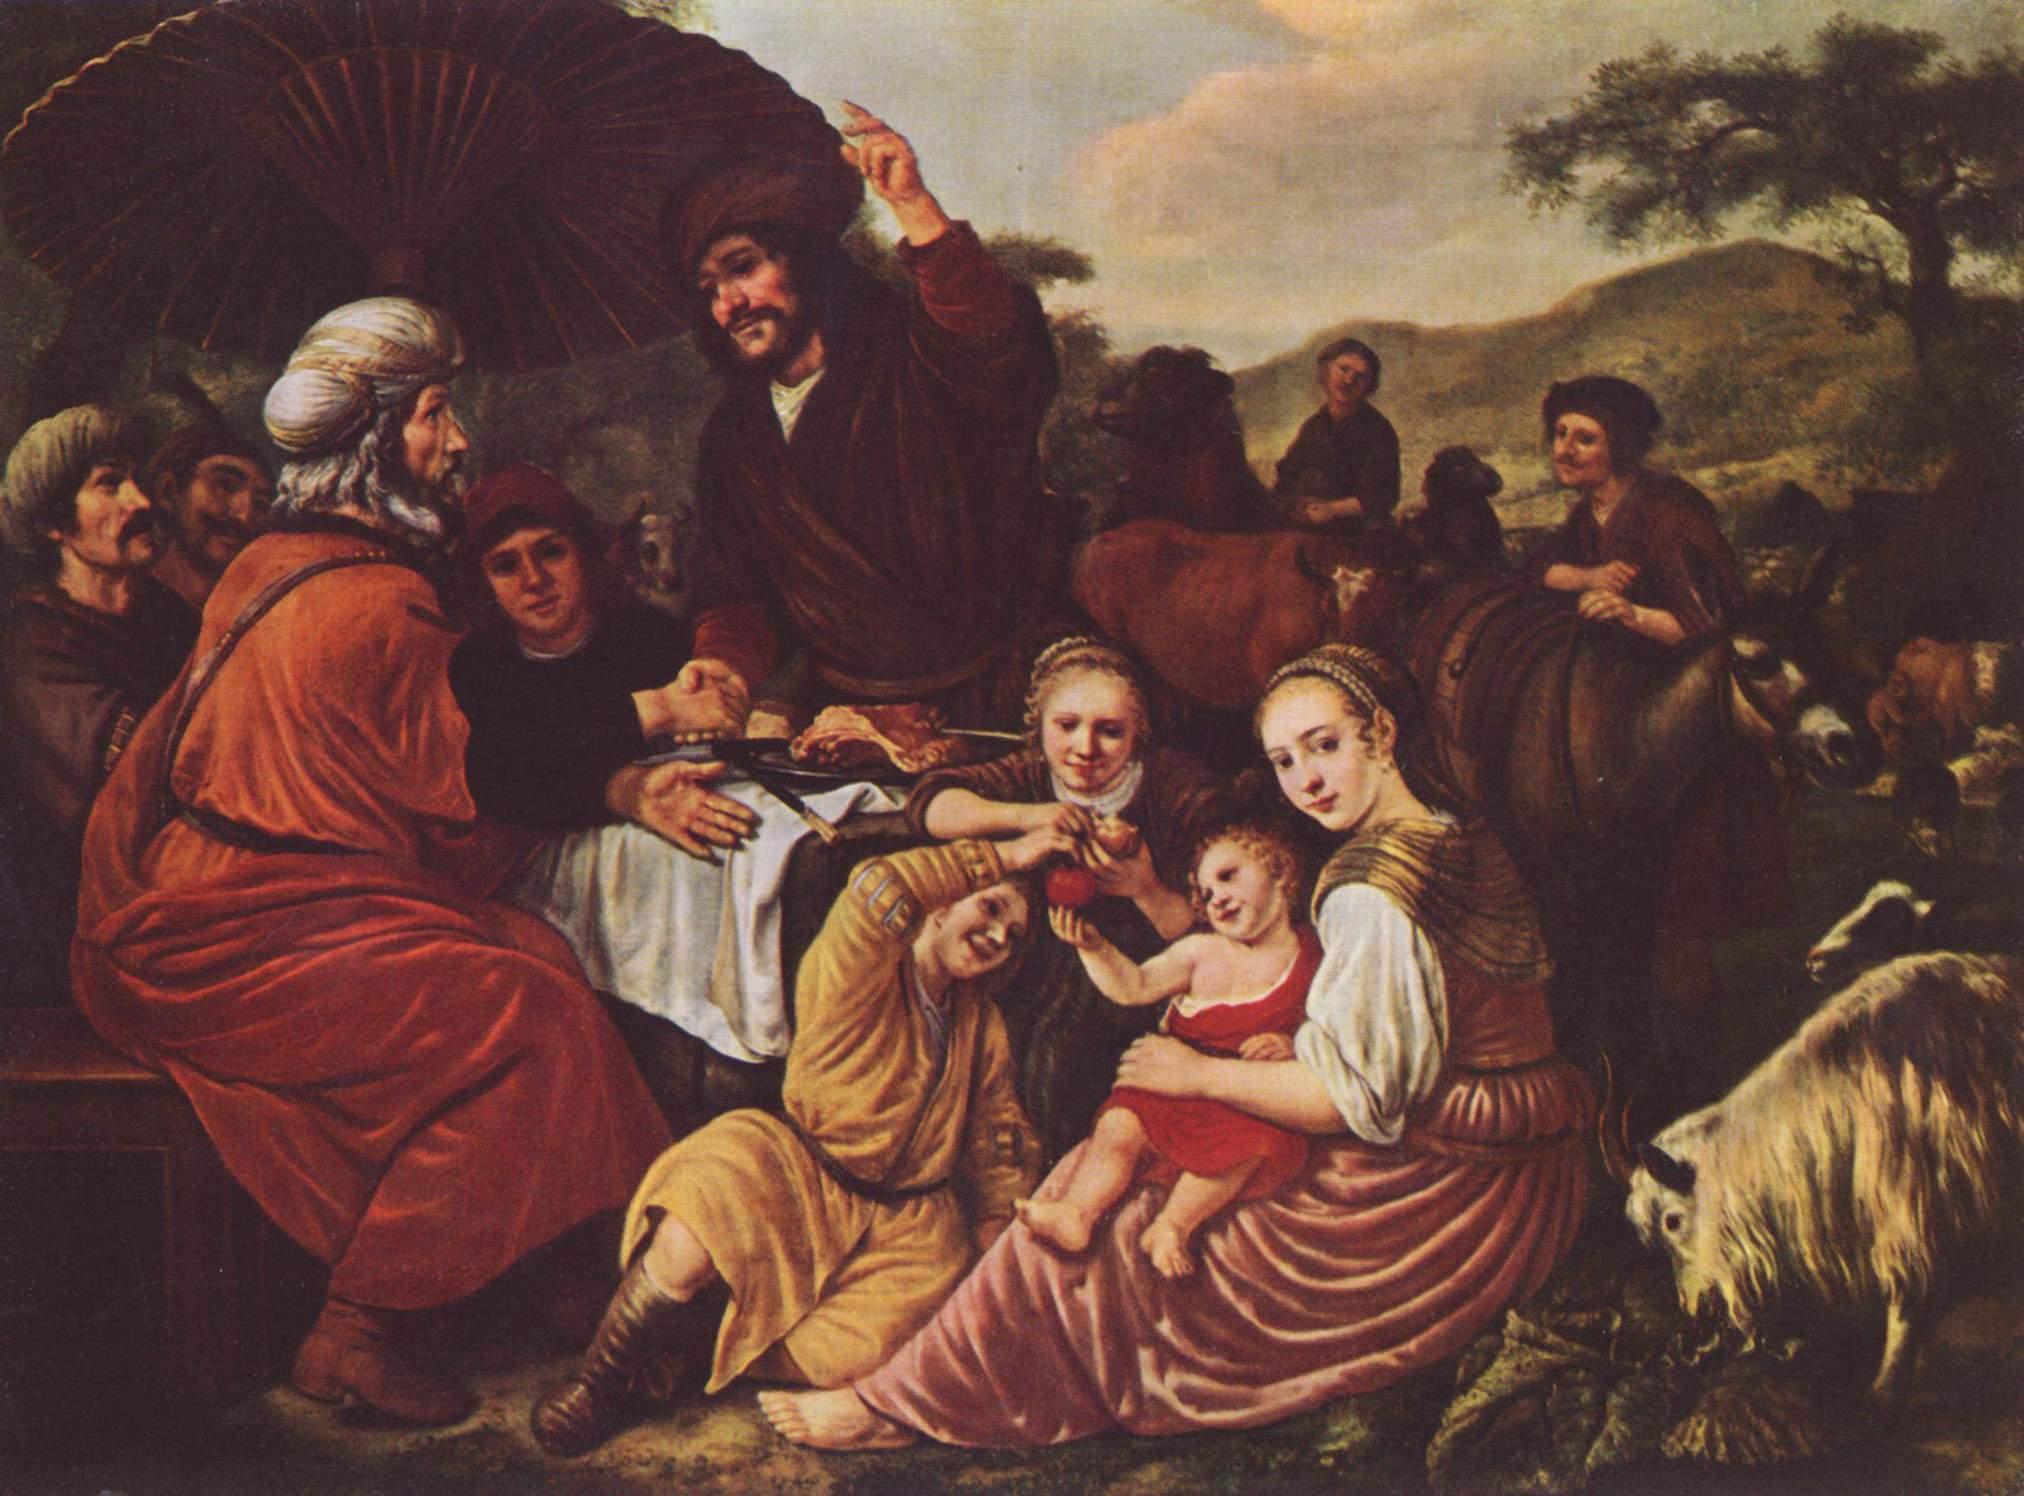 Пир Йитро и Моше. Ян Викторс, 1635